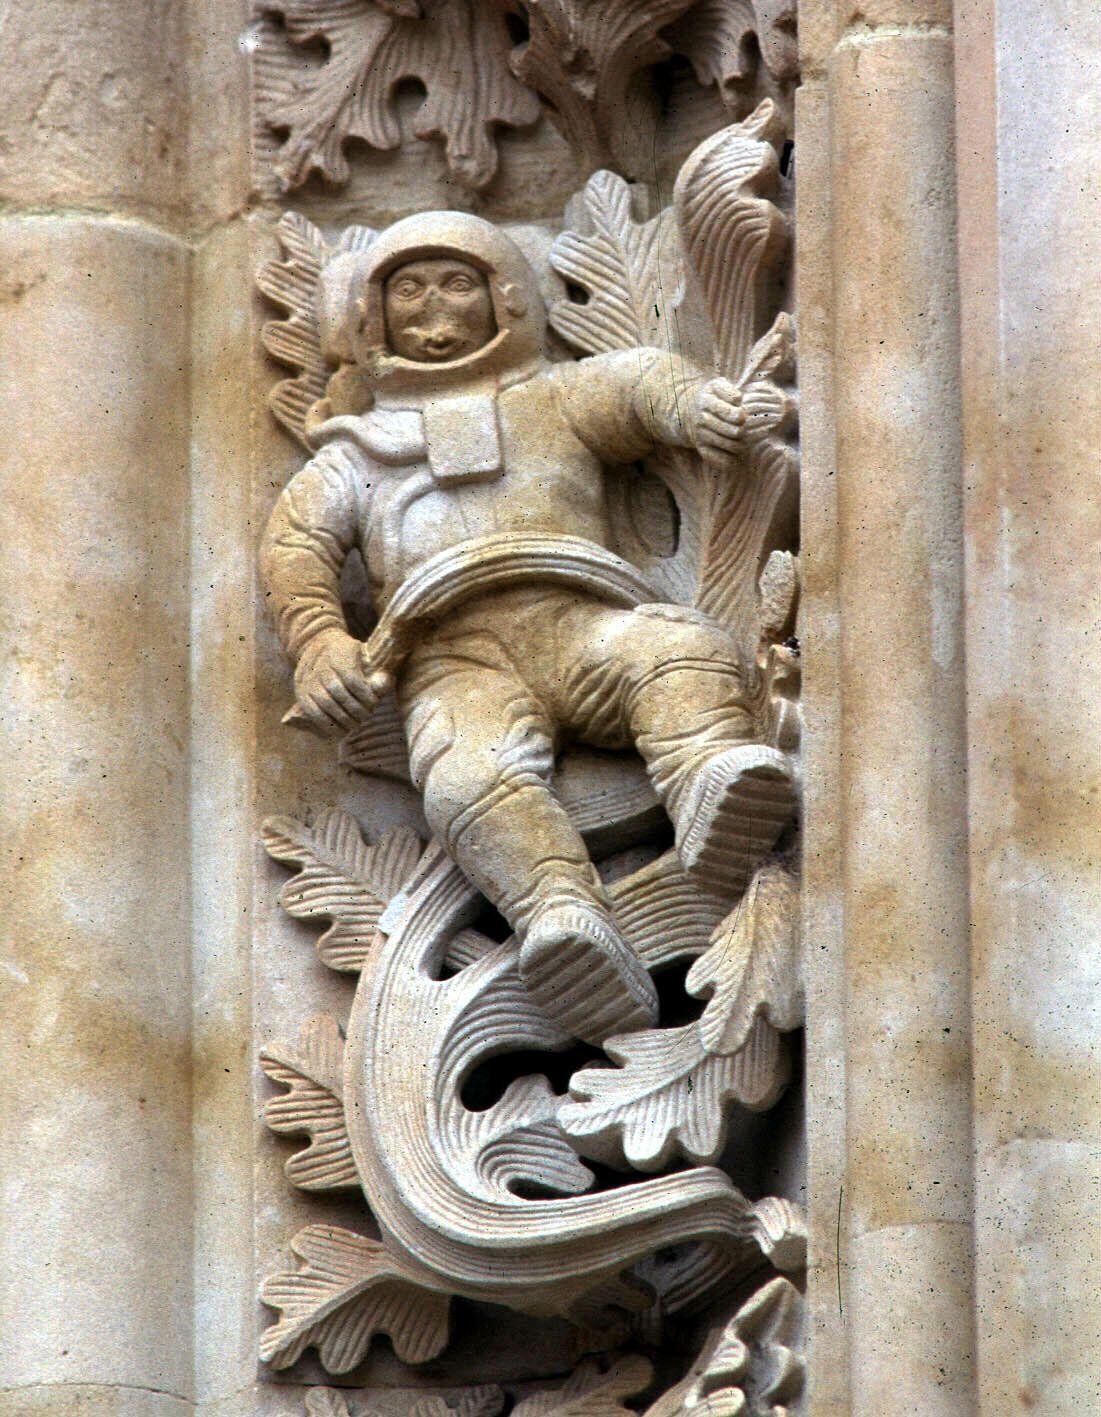 Spania_Salamanca_Astronauta